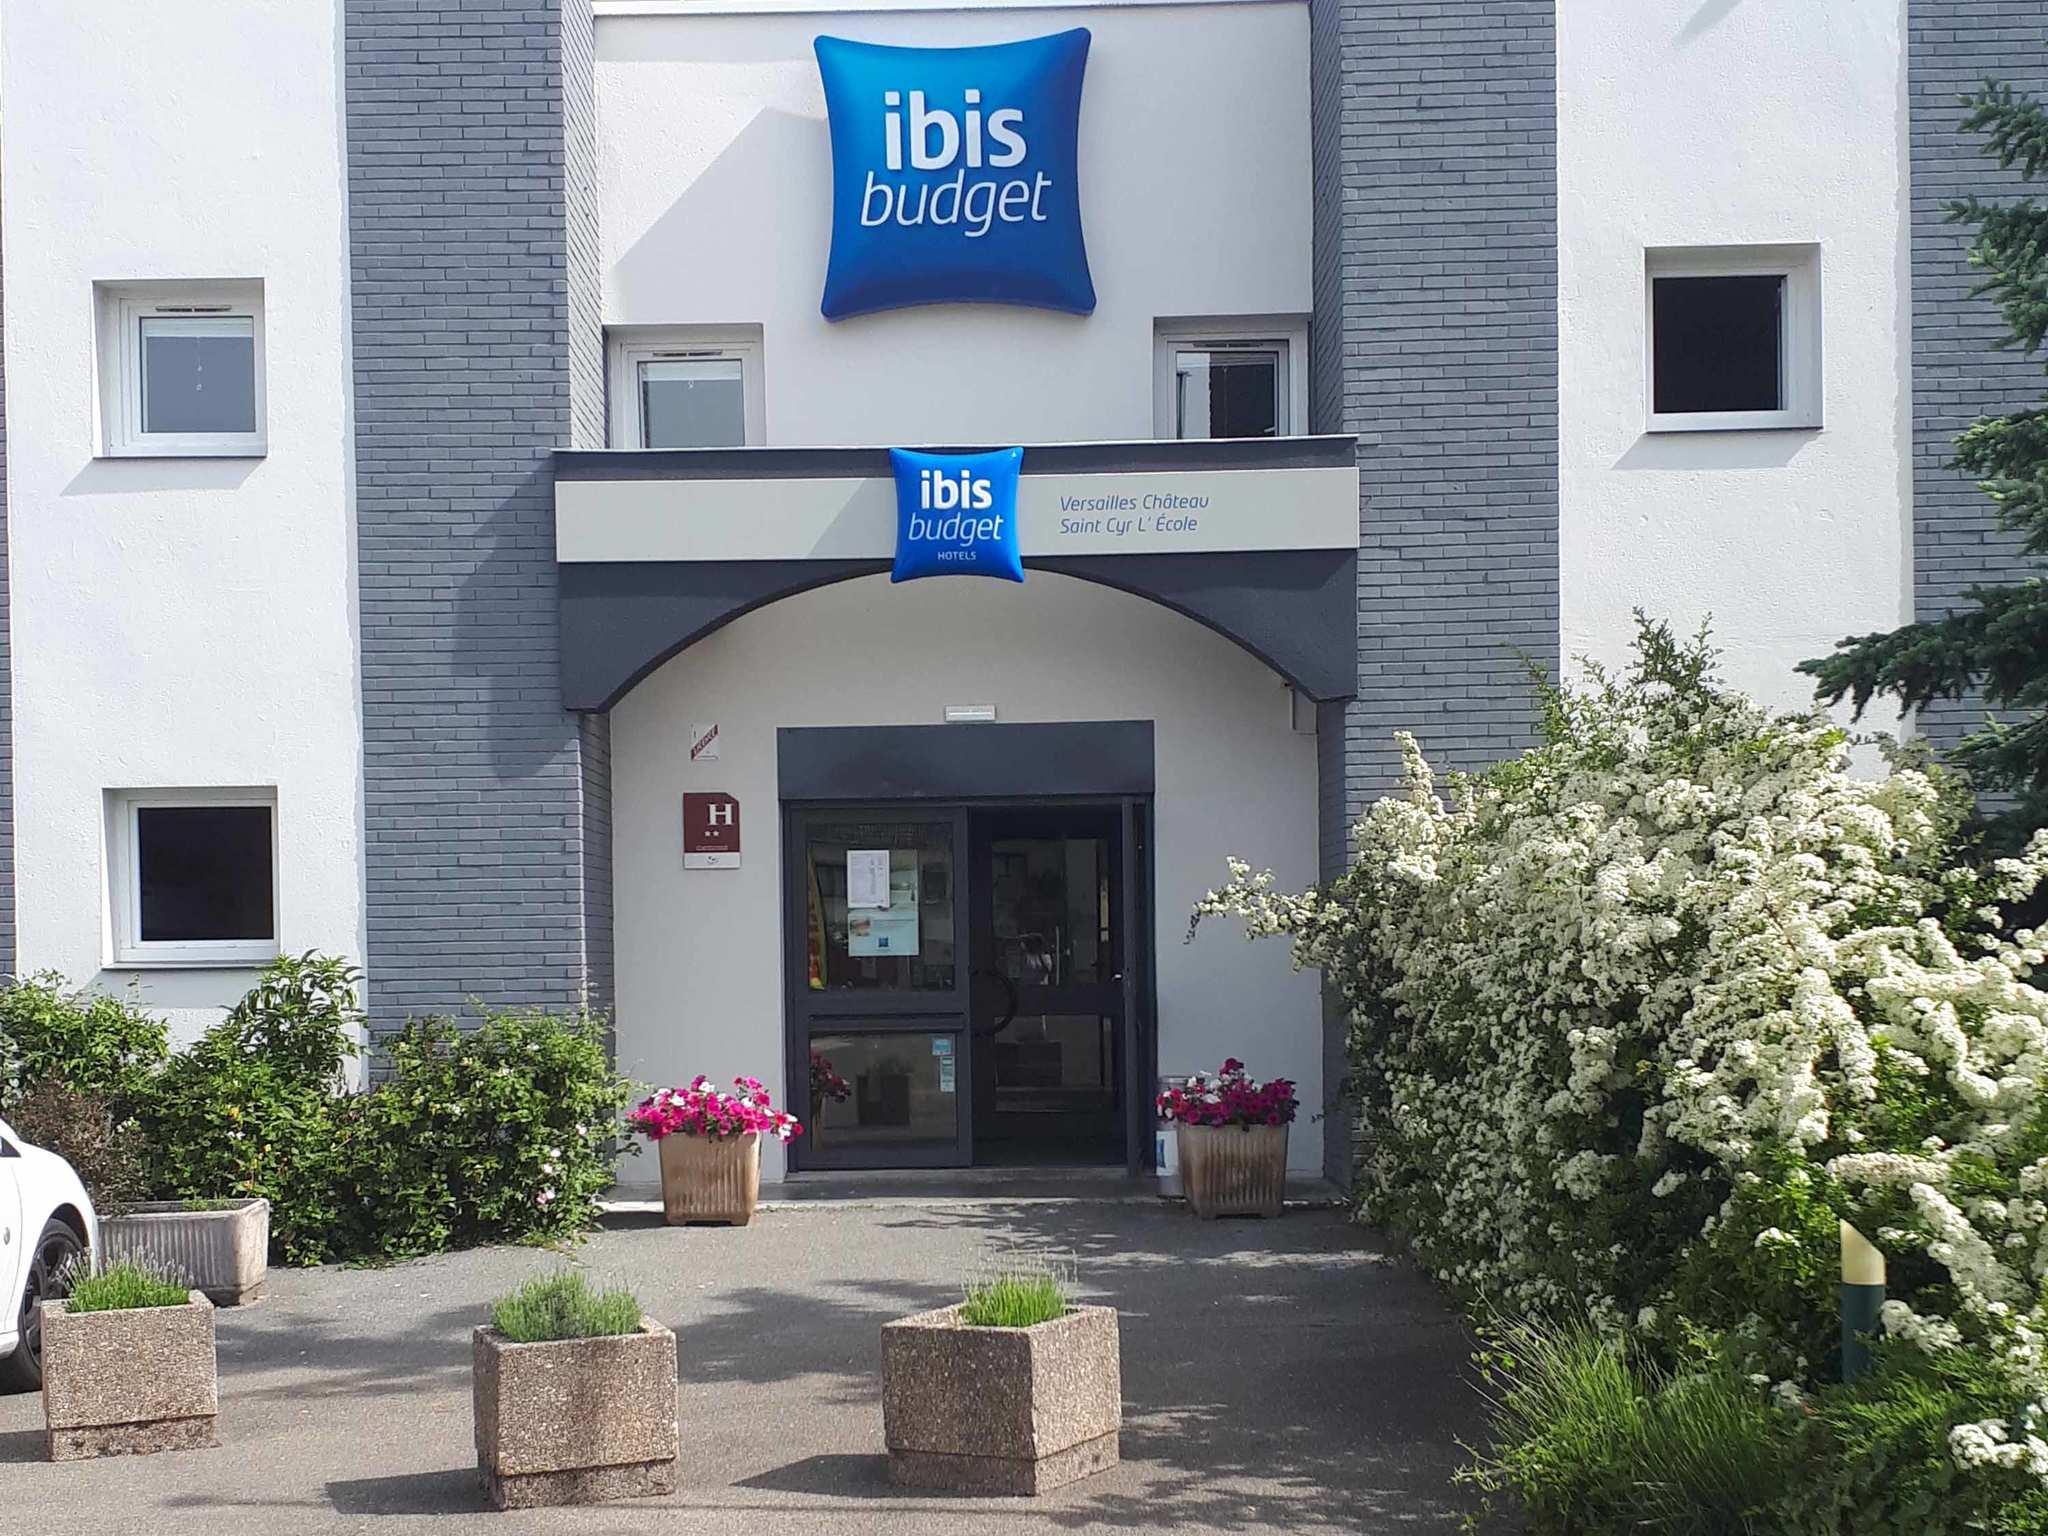 فندق - ibis budget Versailles Château Saint-Cyr